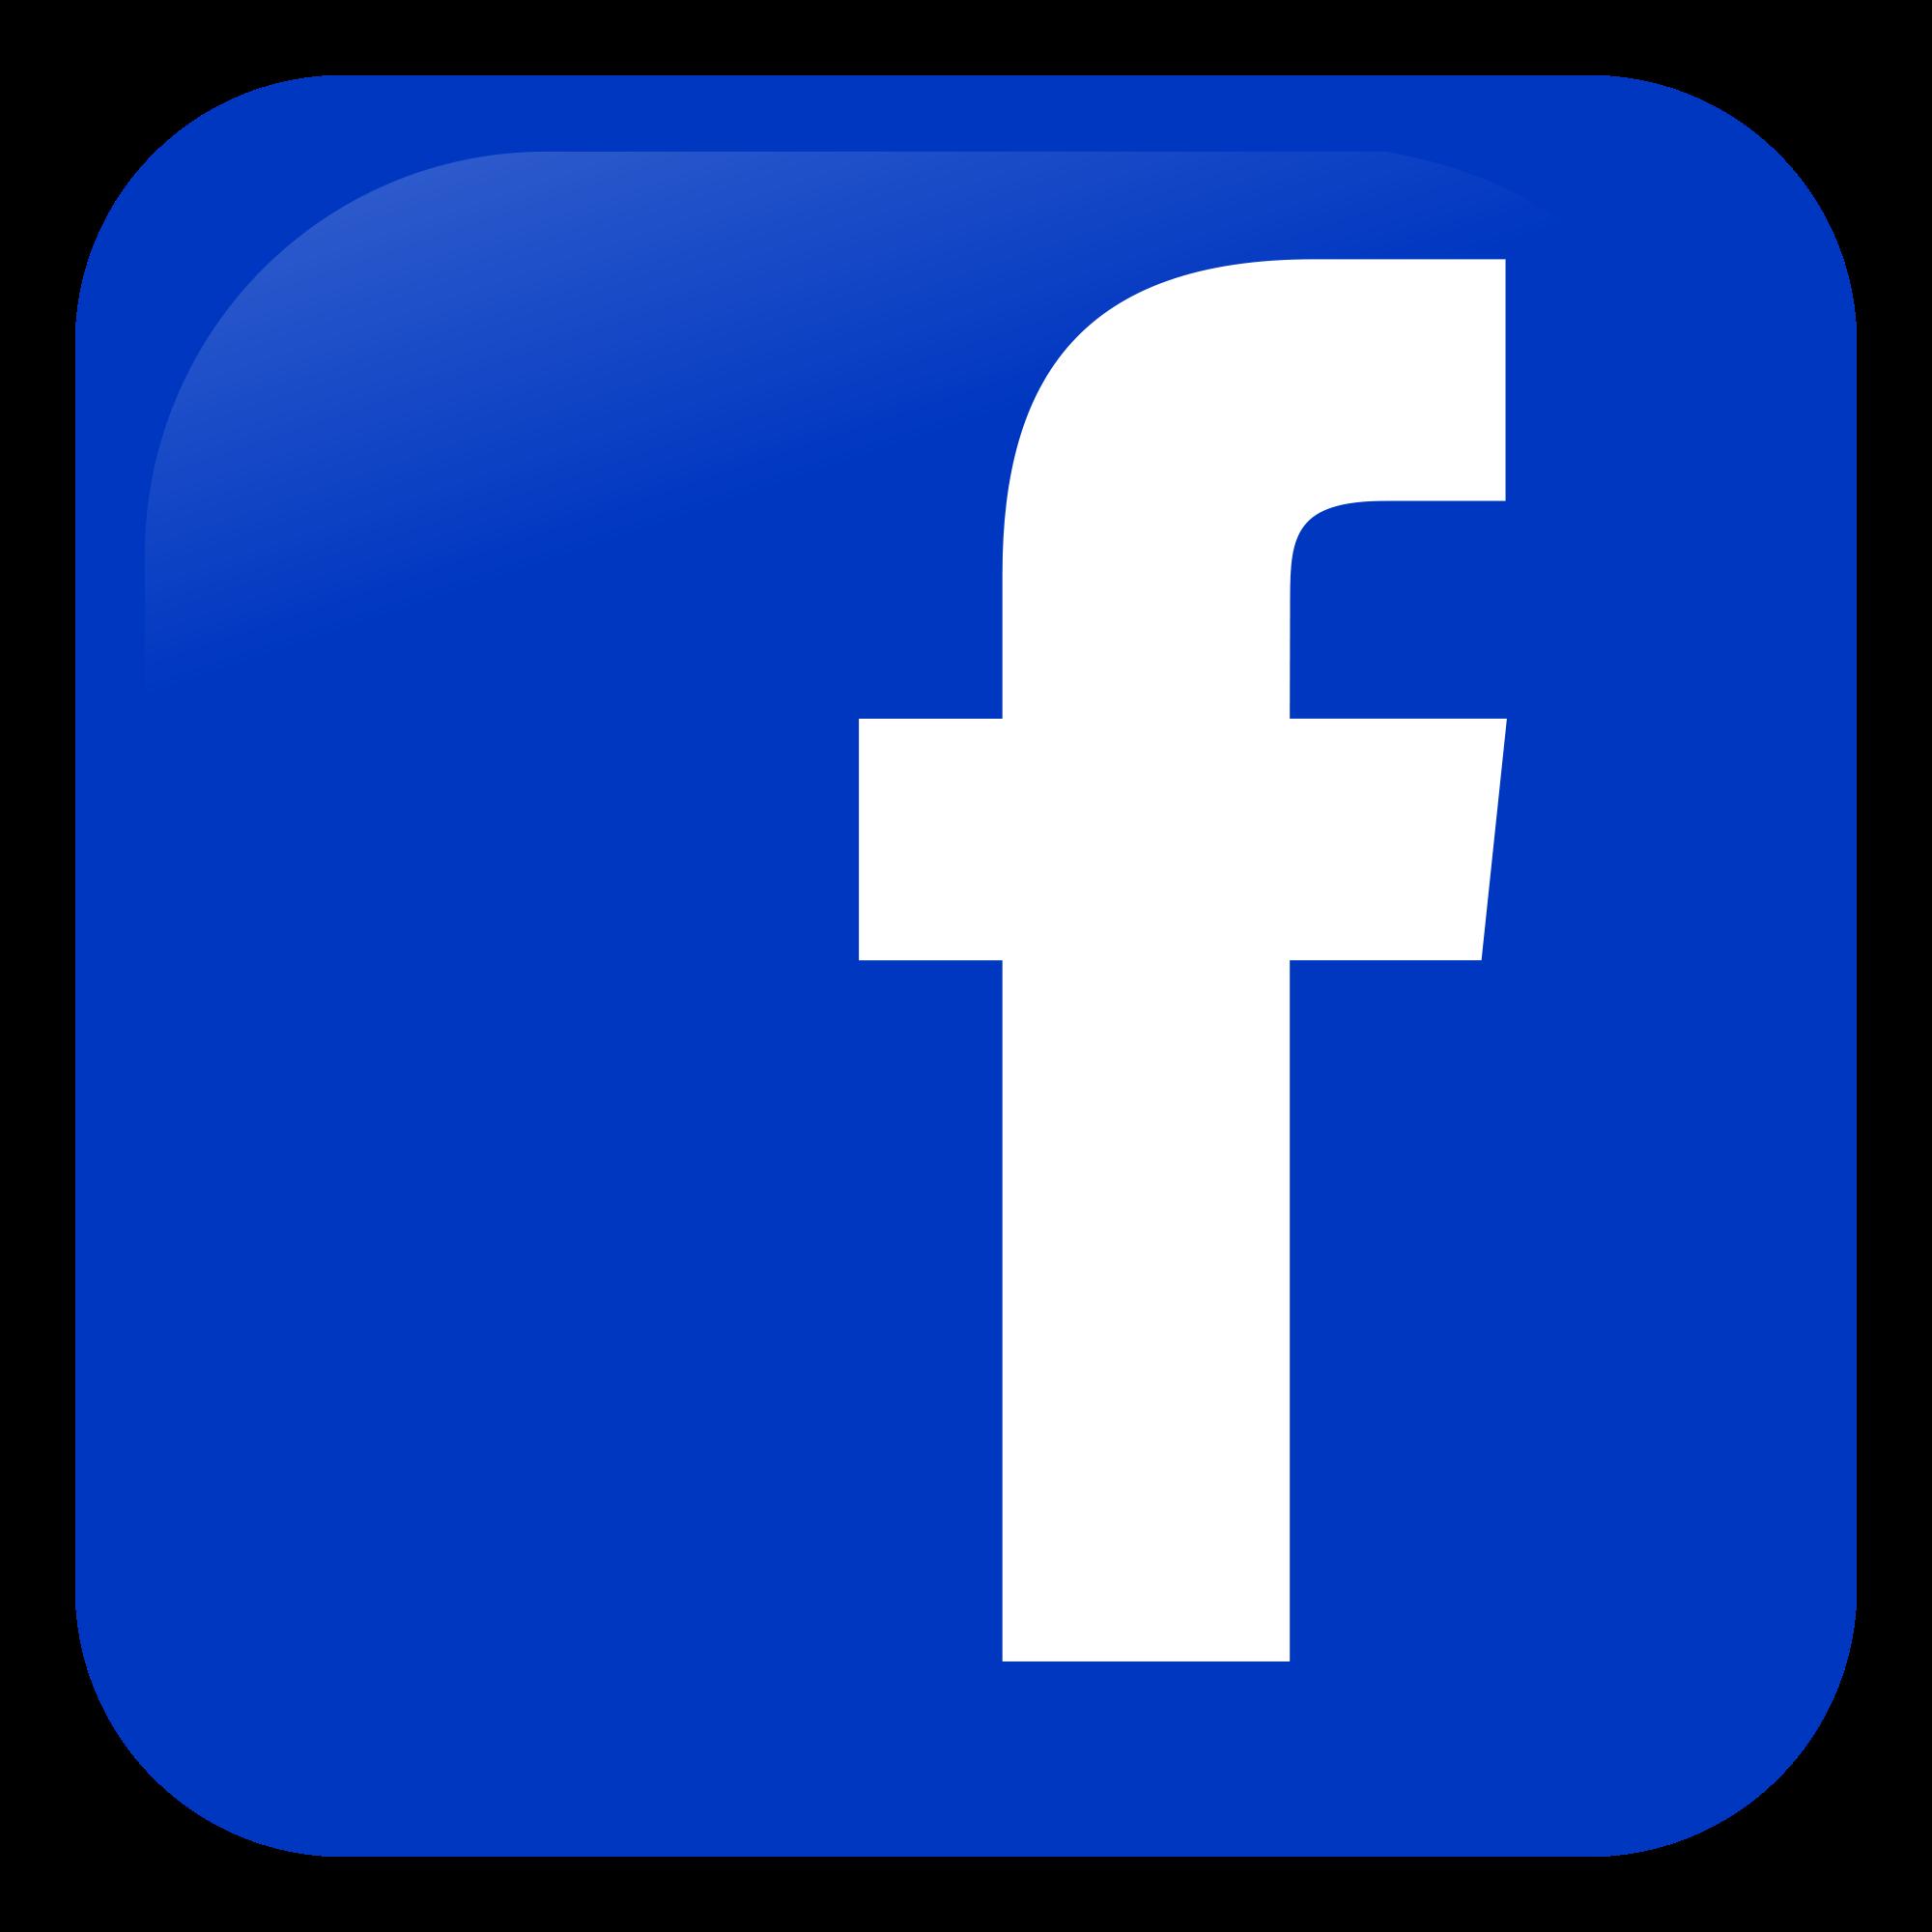 Facebook Logo Image #4-Facebook Logo image #4-10